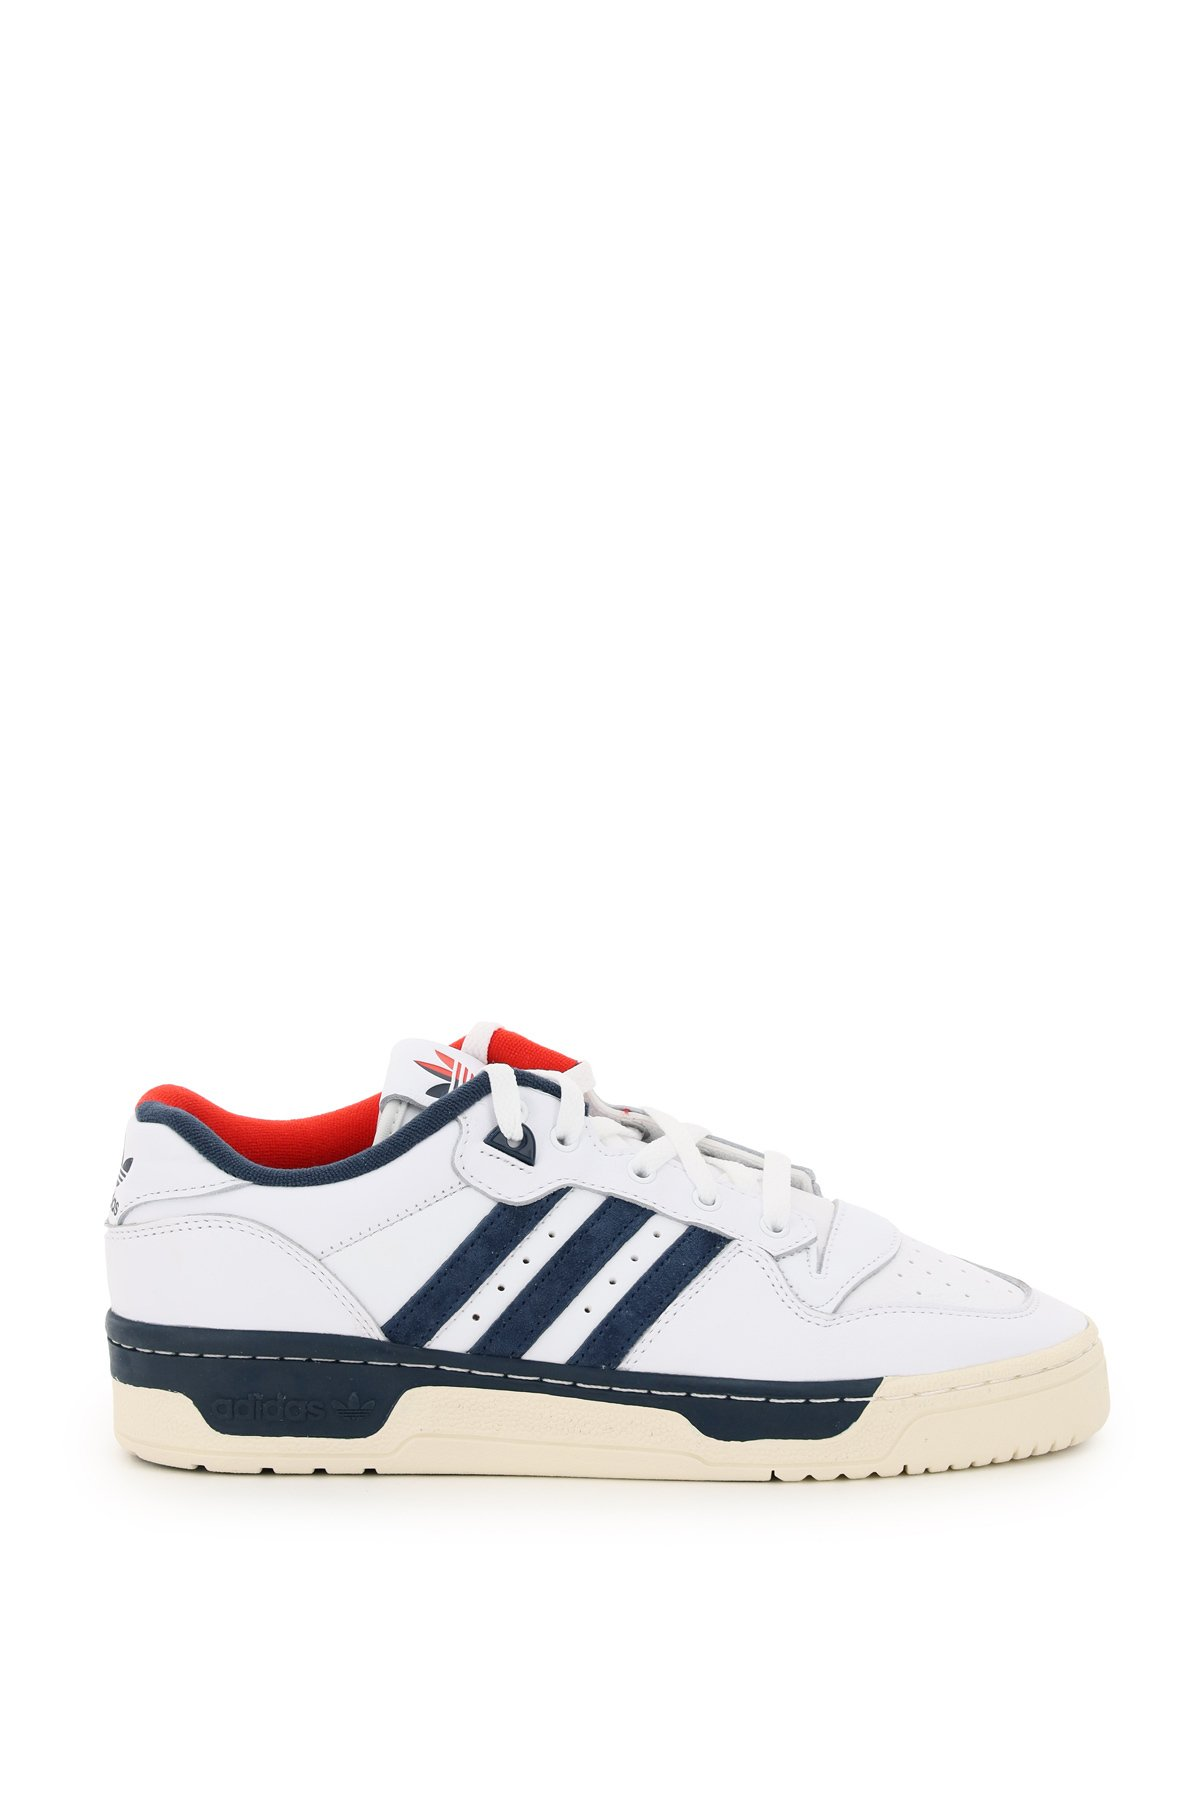 Adidas sneakers rivalry low premium